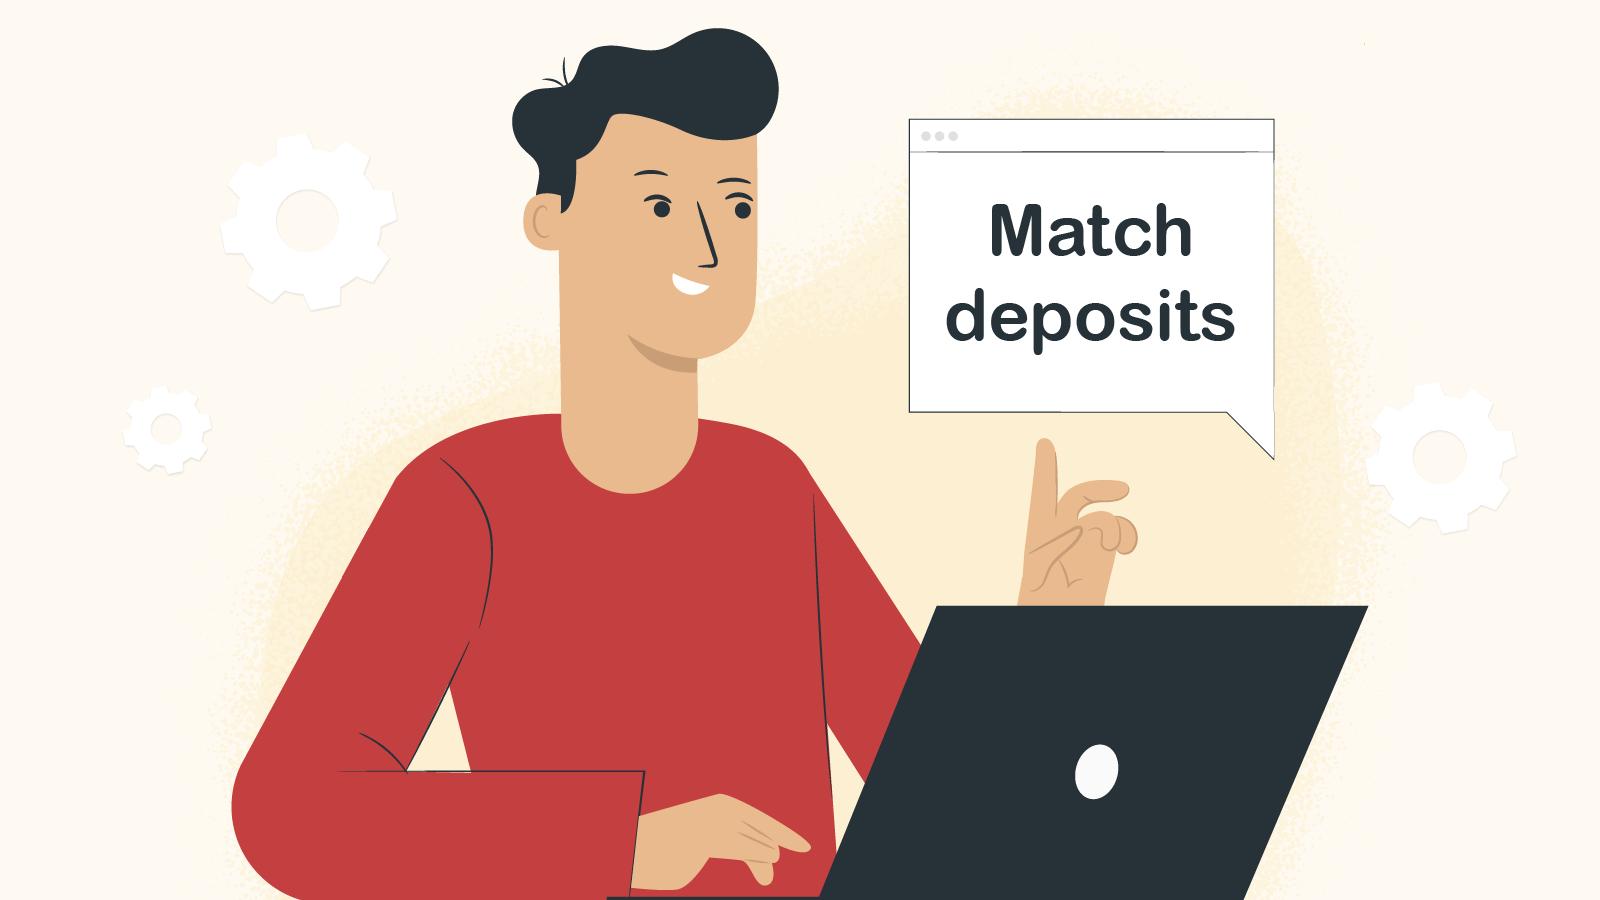 Match deposits